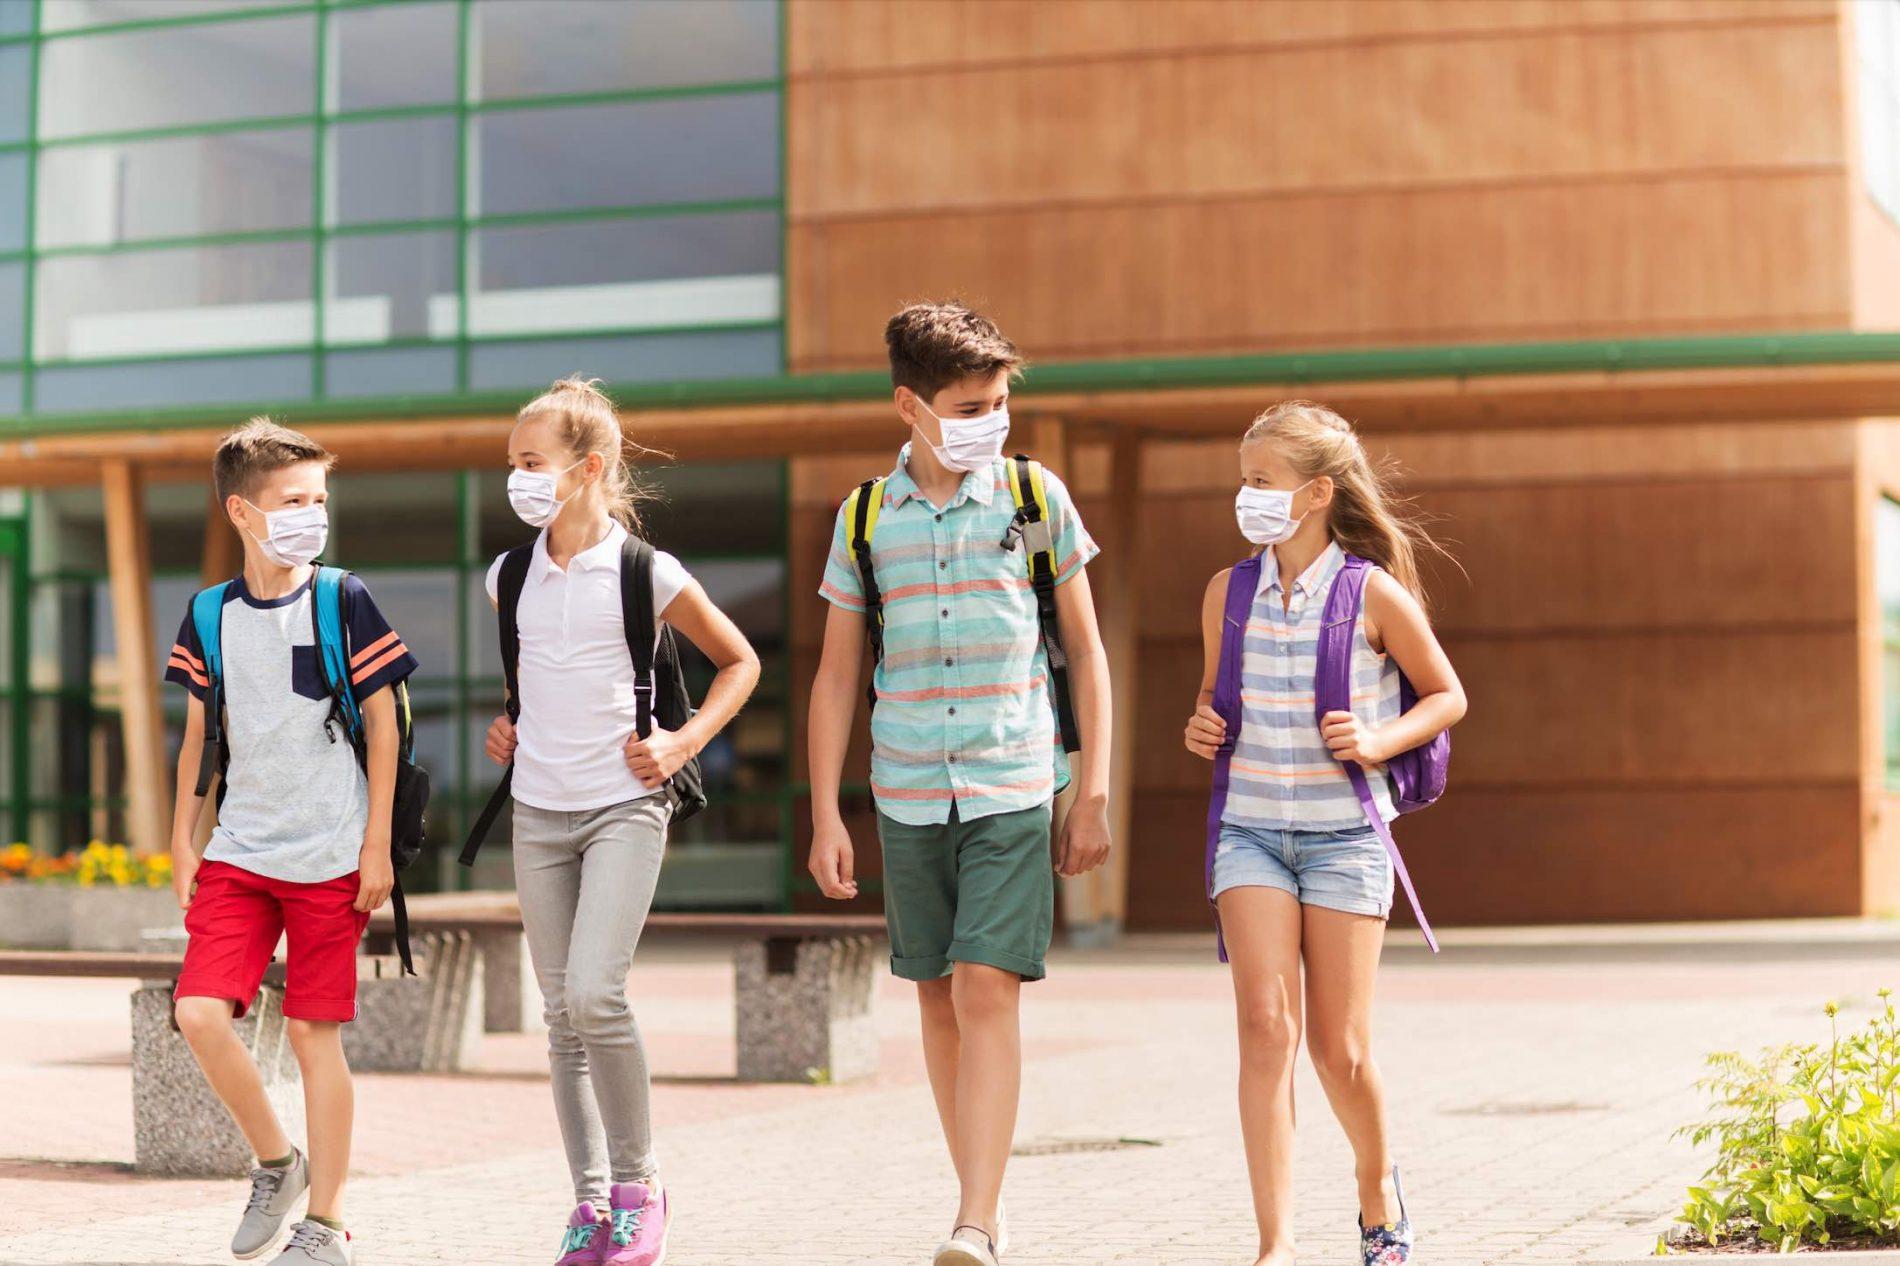 School Security Vulnerabilities - Window Retrofit Addresses Weakness - Security Window Film in Buffalo, New York